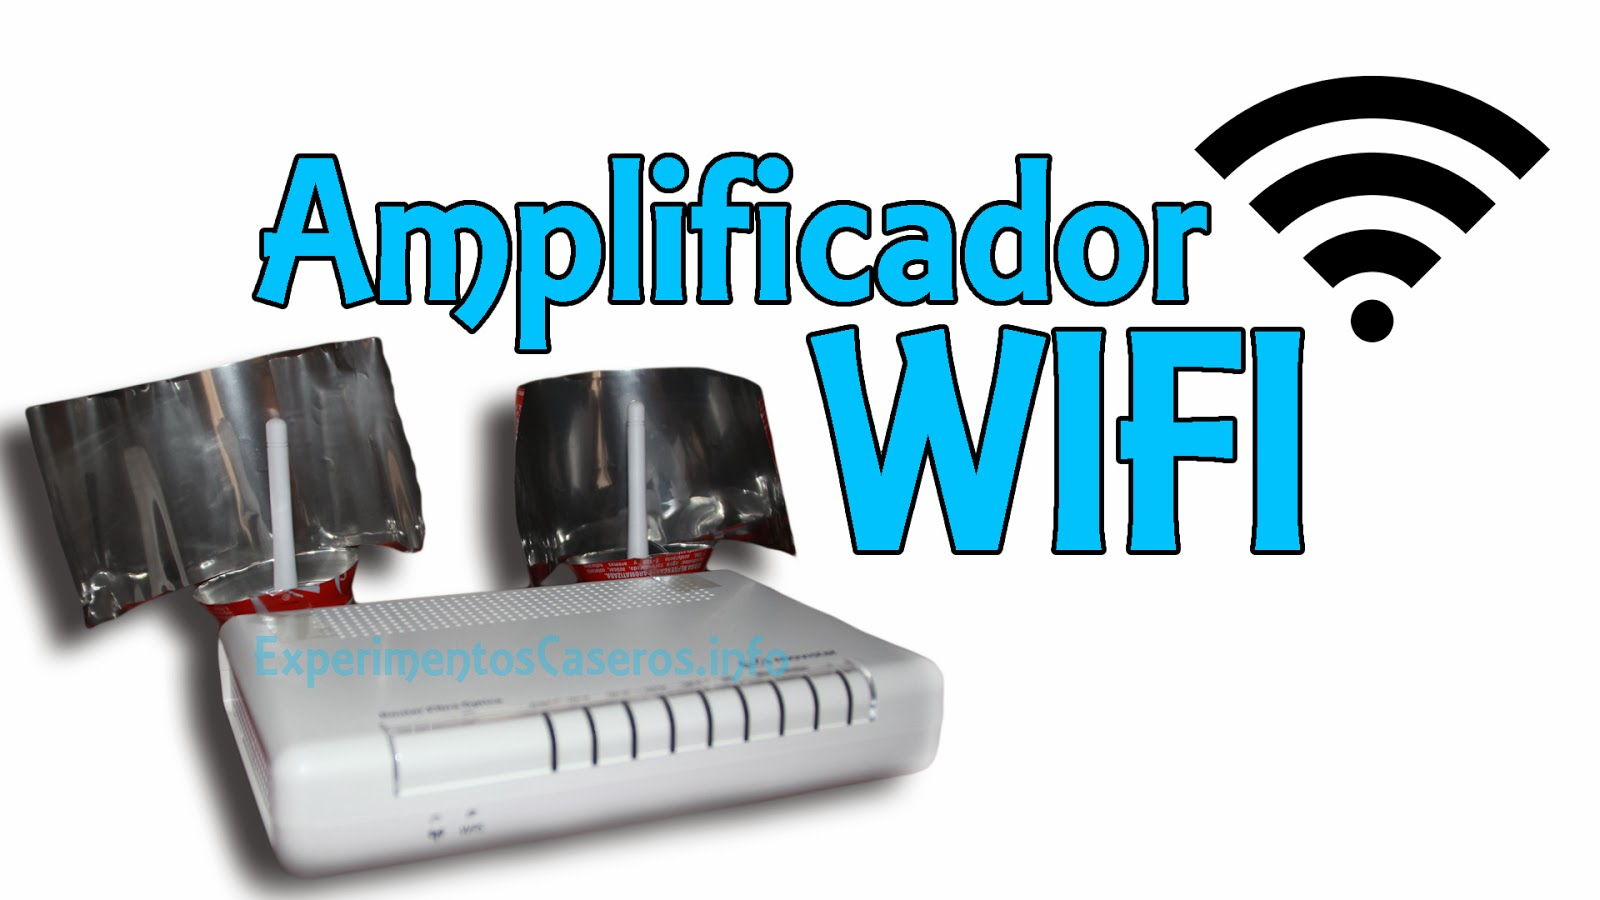 Amplificador wifi con latas, amplificador wifi casero, experimentos caseros, experimento